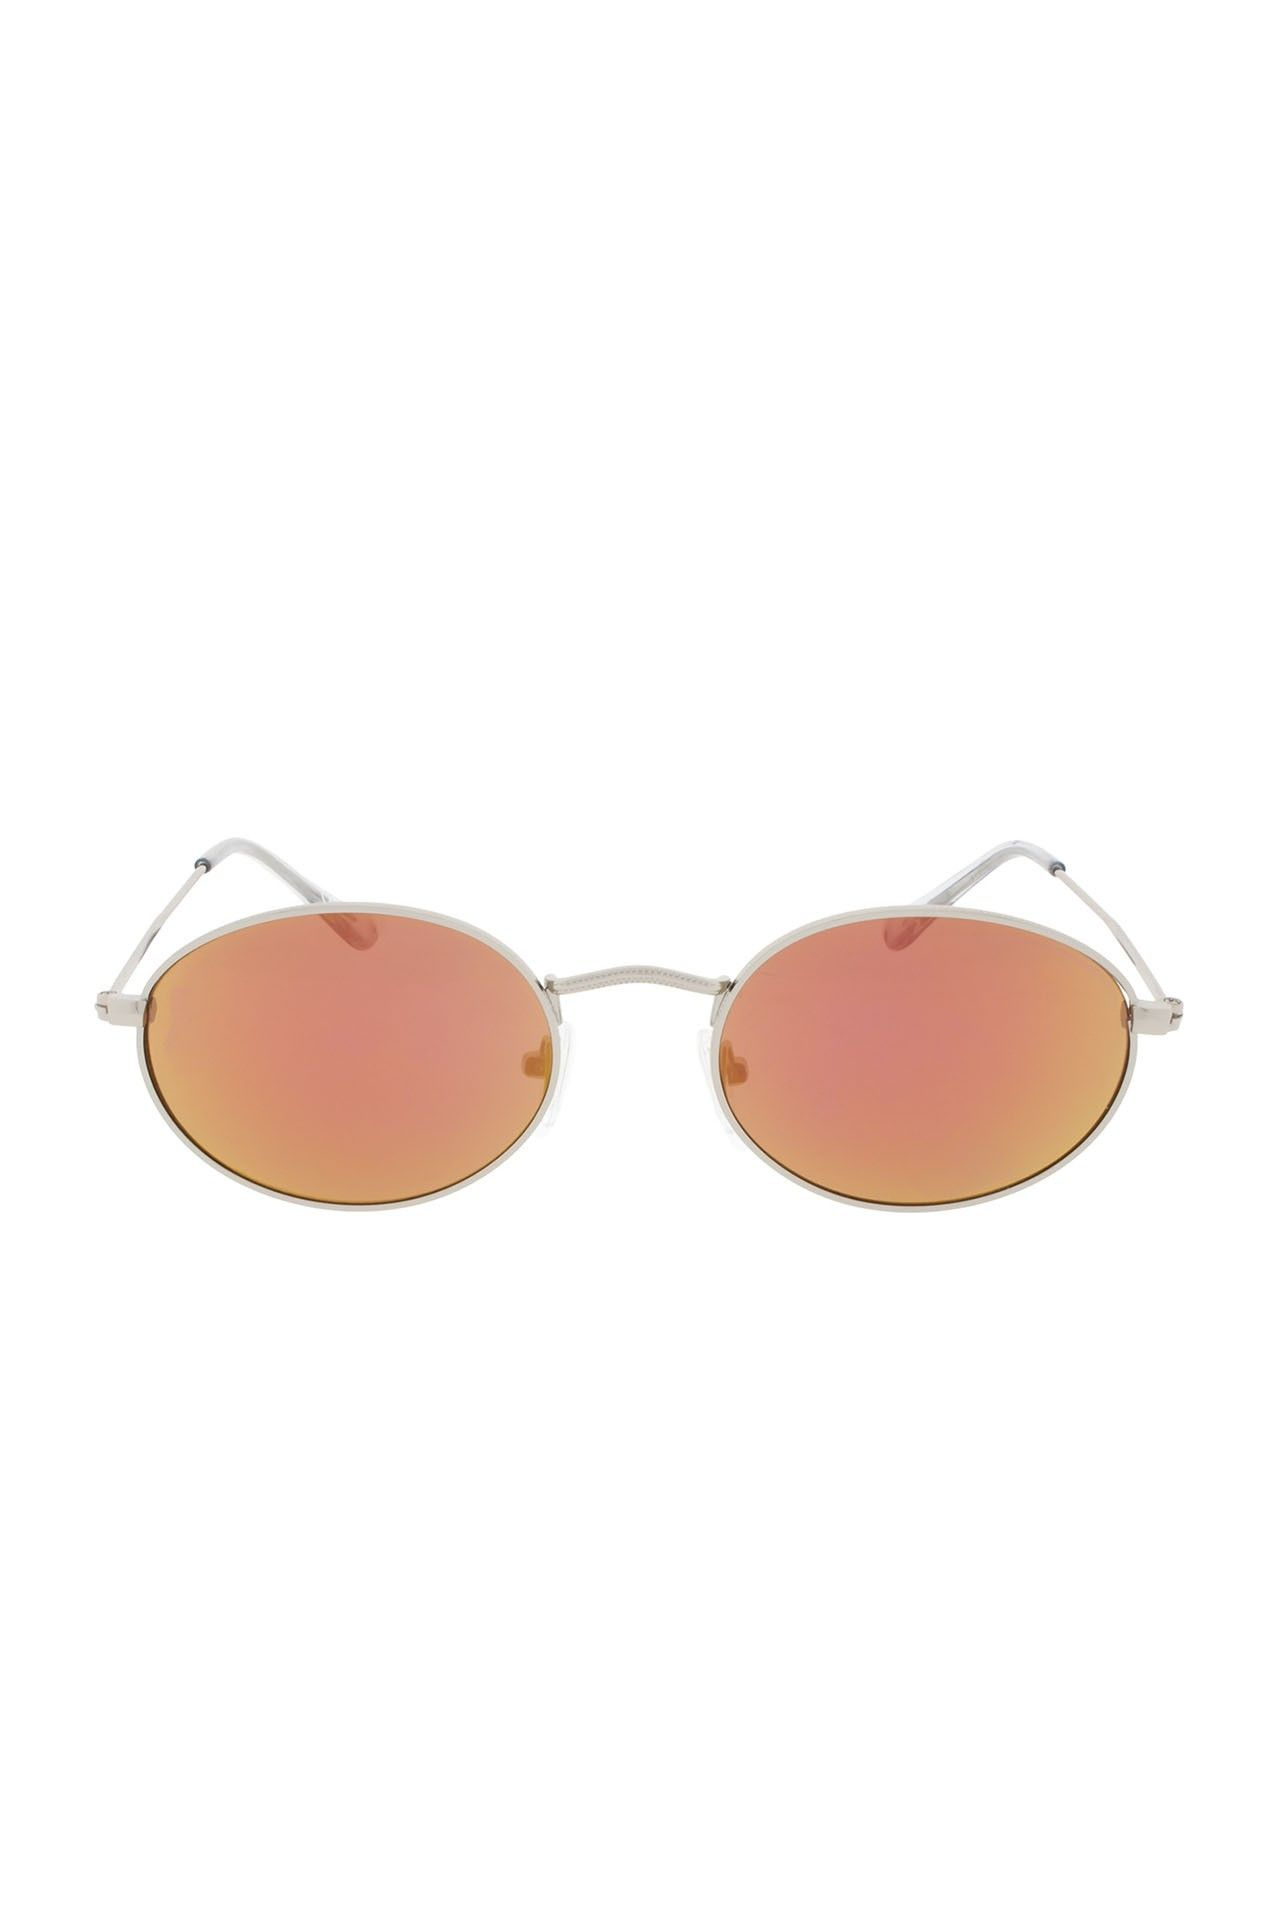 Afbeelding van Icon Eyewear M170902 A Silver / Pink Mirror